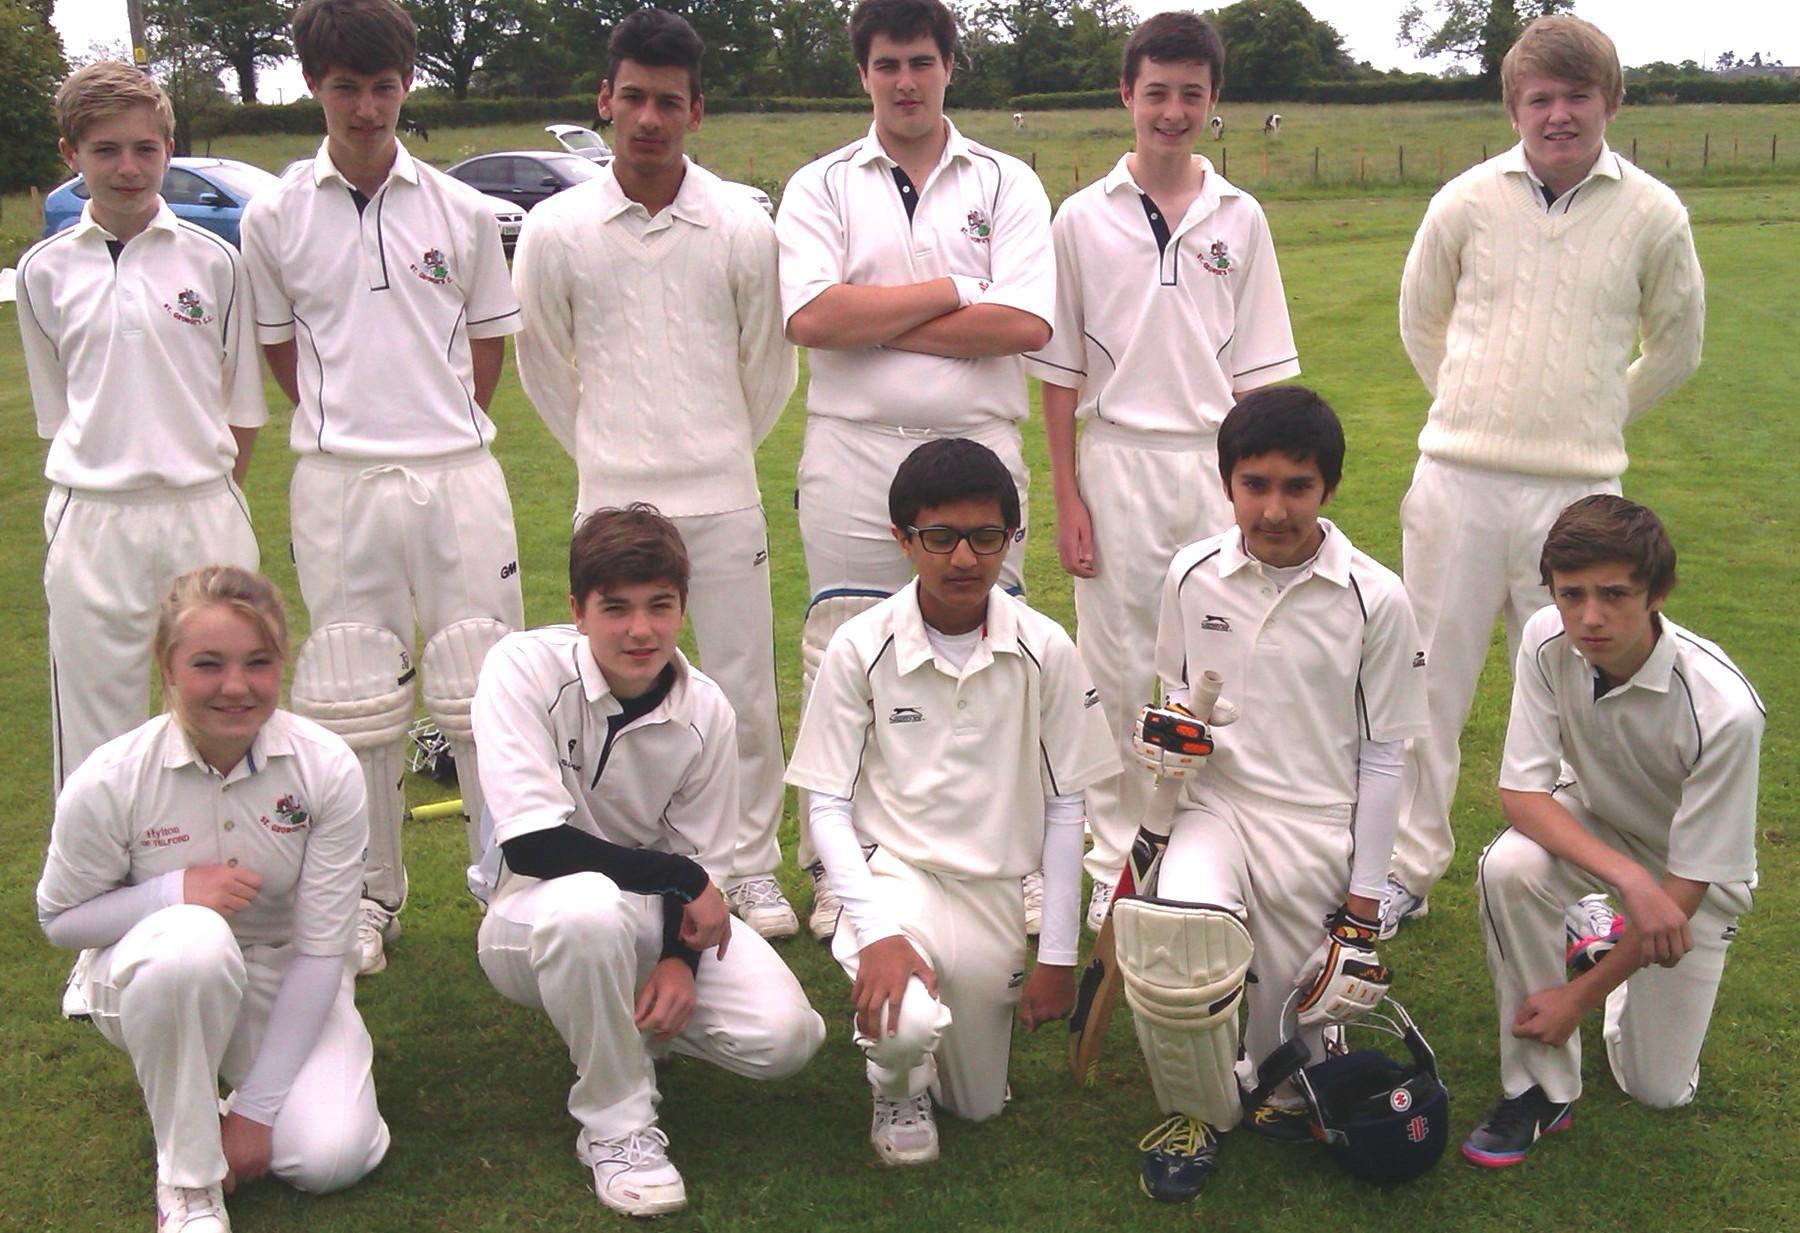 U15 team June 2013